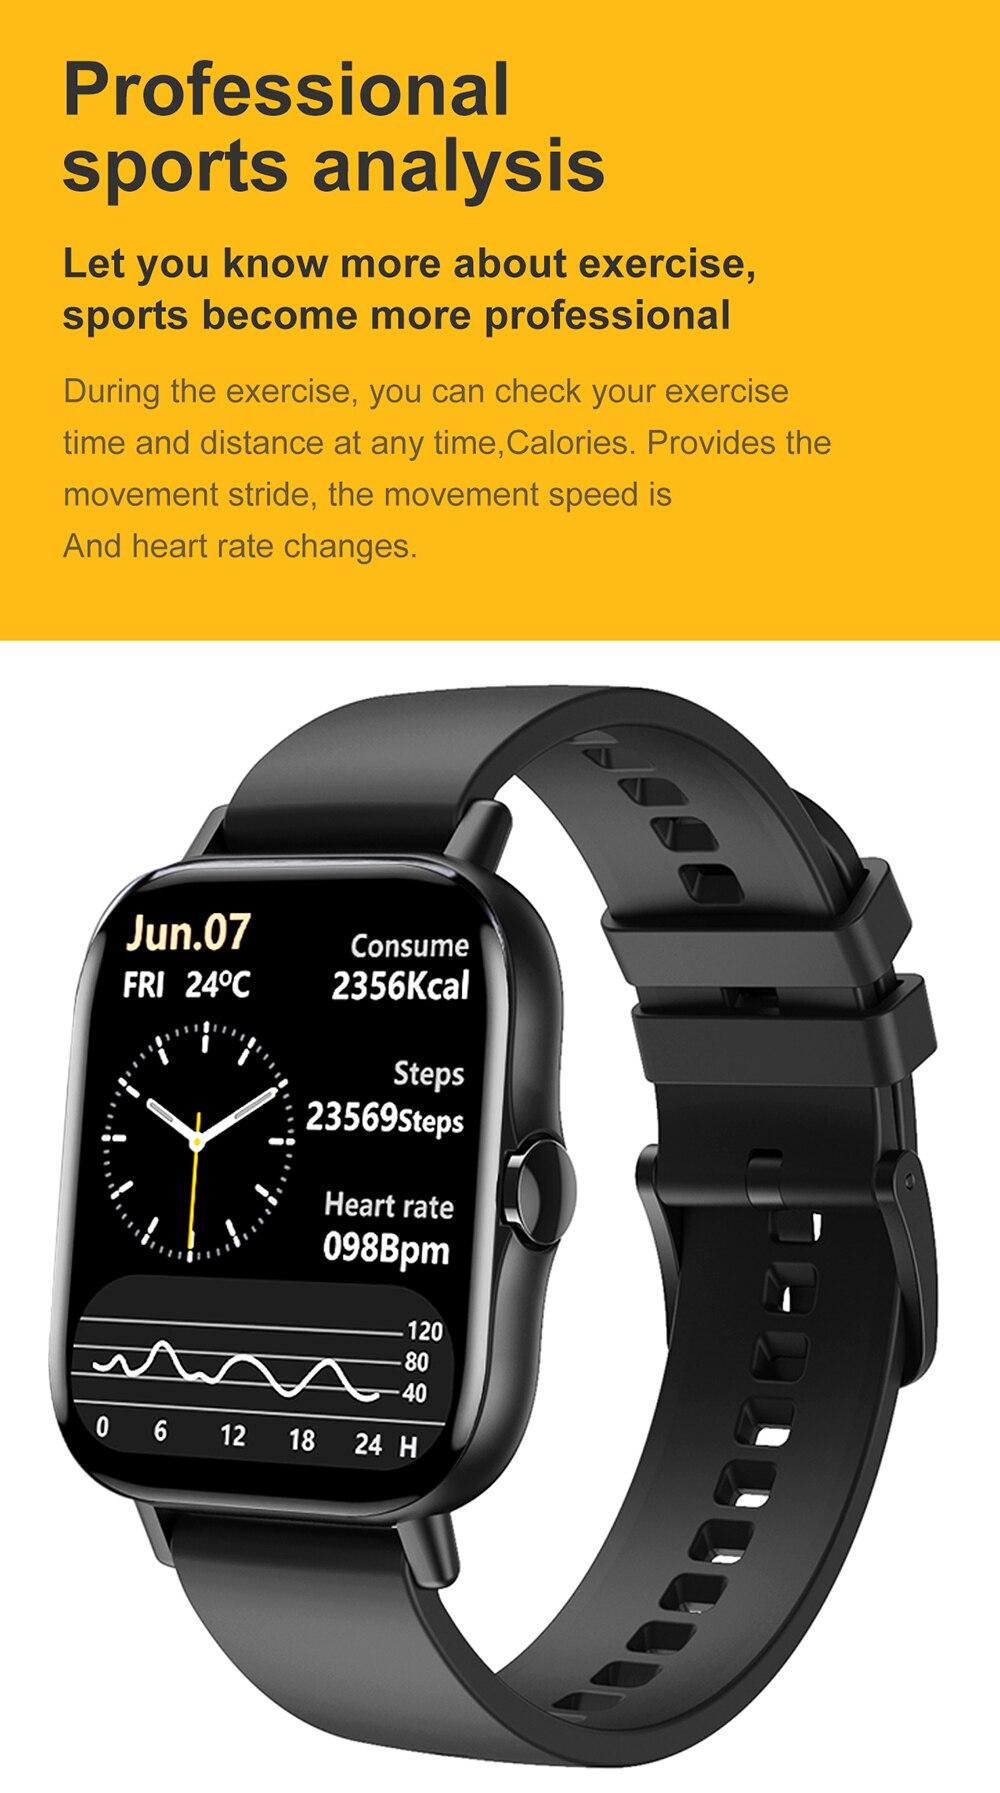 H21acfb54aea2470b9552c1fe7141cee09 For Xiaomi Apple Phone IOS Reloj Inteligente Hombre Smartwatch 2021 Men Bluetooth Call Smart Watch Man Woman Full Touch IP68